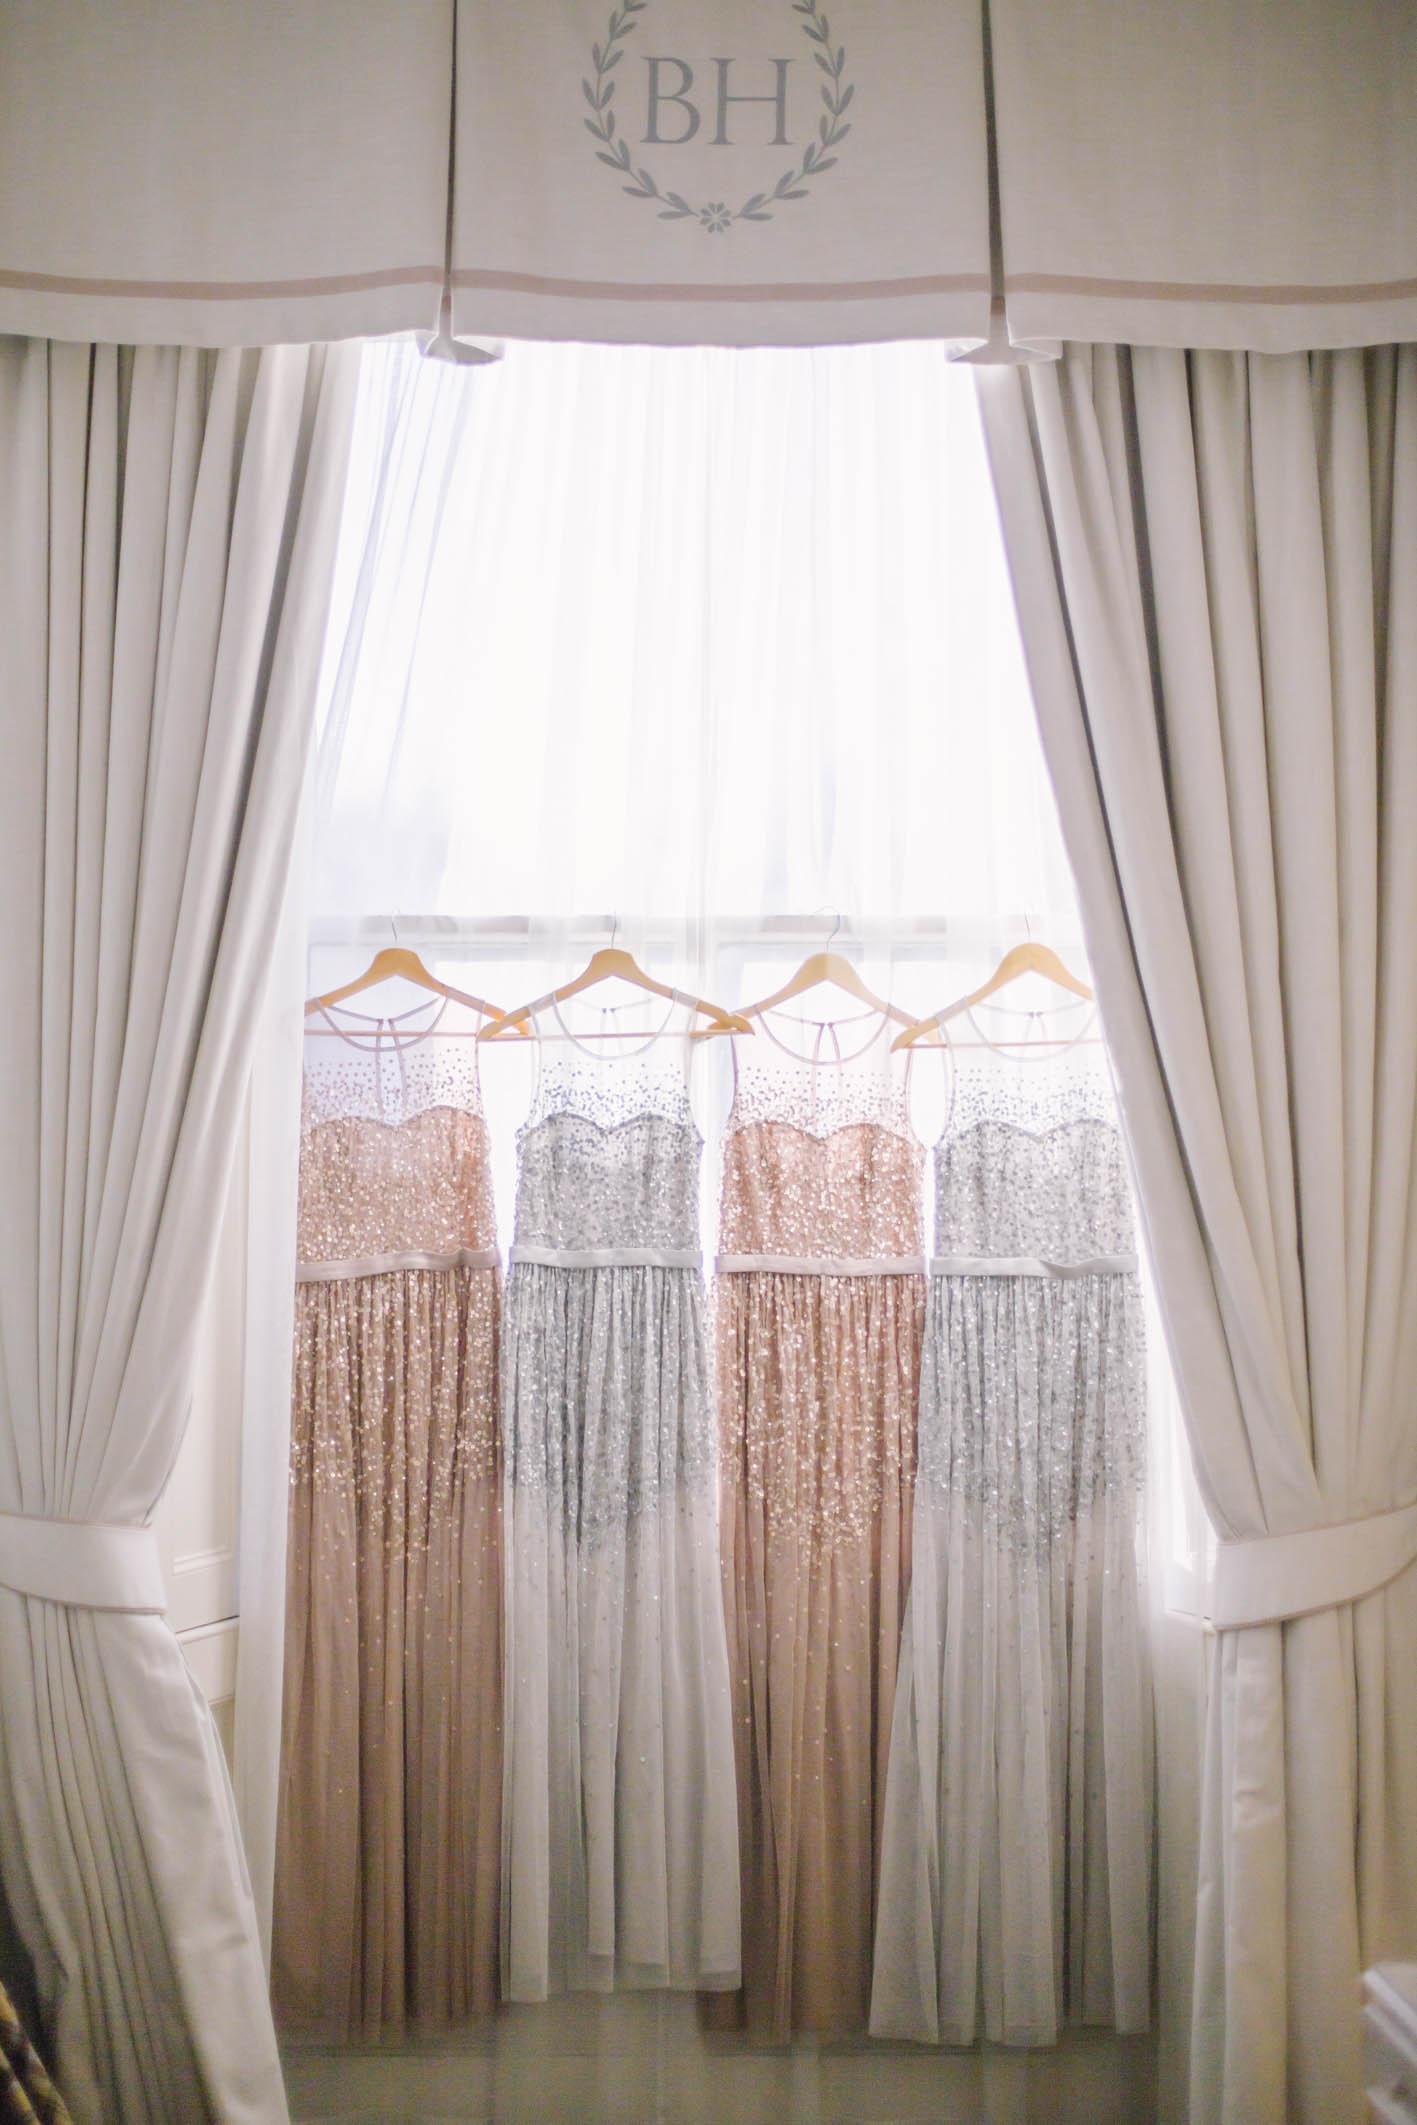 Balbirnie House Wedding captured by Edinburgh Wedding Photographer Ceranna Photography | Asos Sparkly Glitter Bridesmaid Dresses